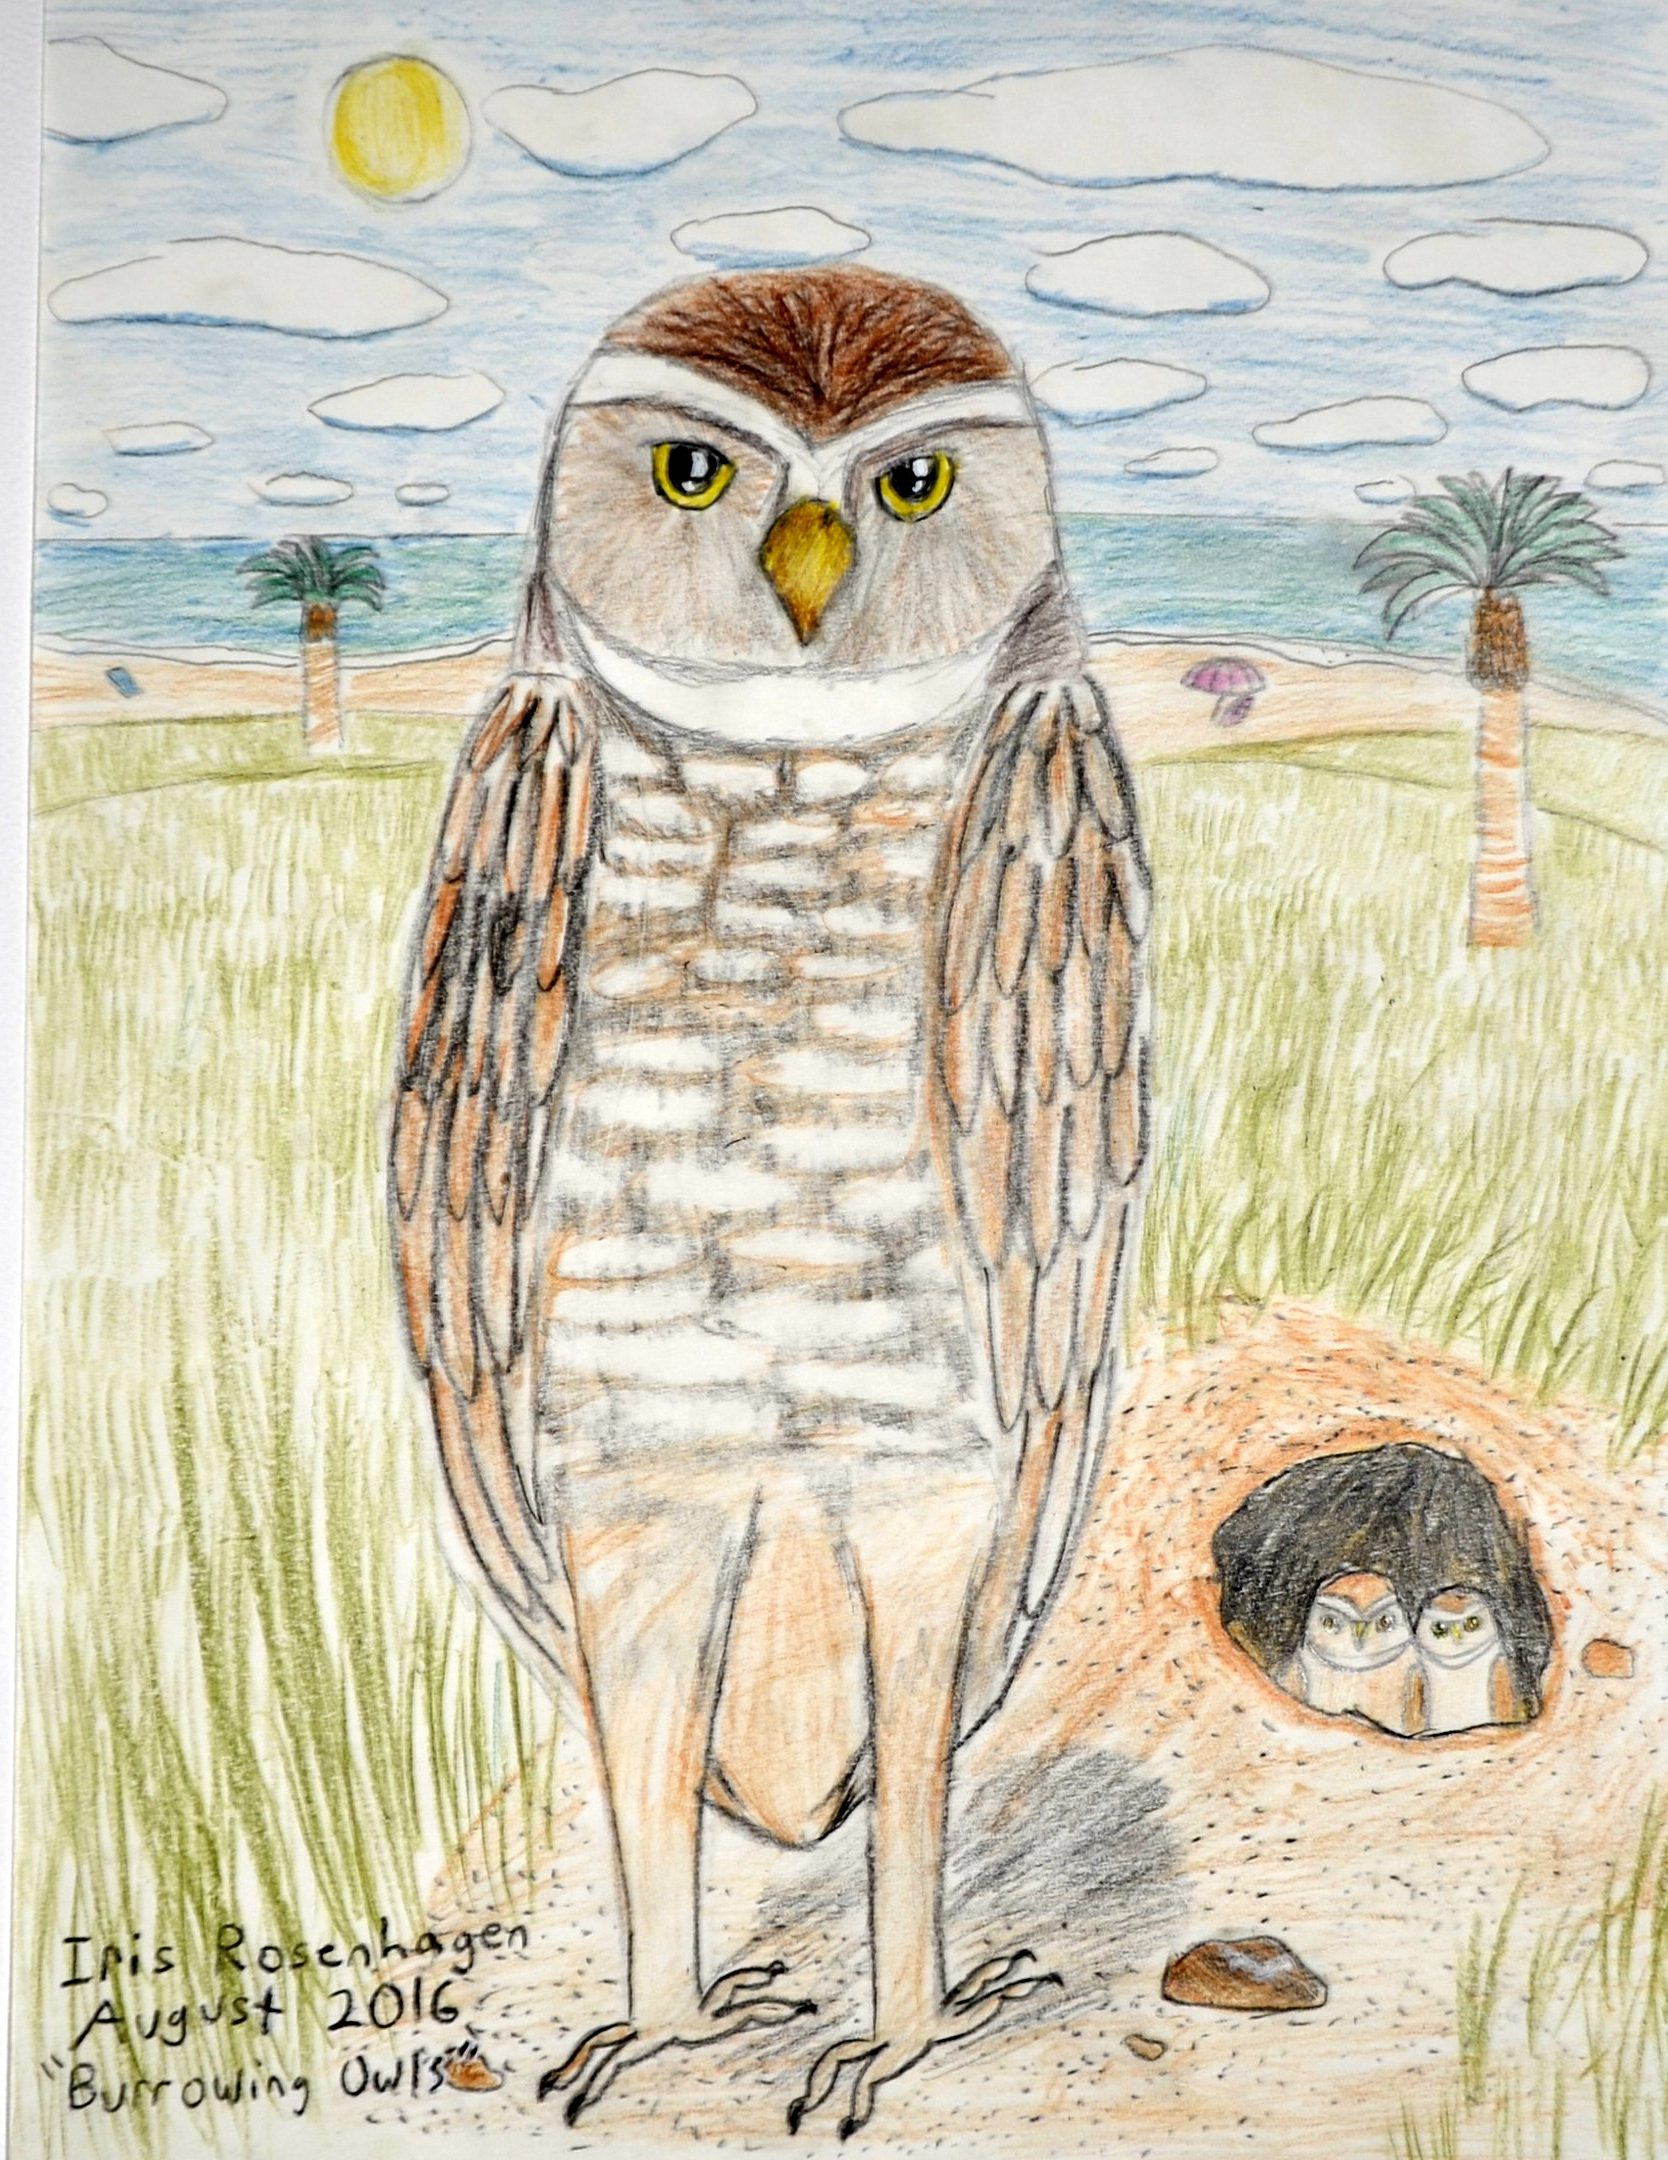 Iris Rosenhagen, Burrowing Owl, Age 11